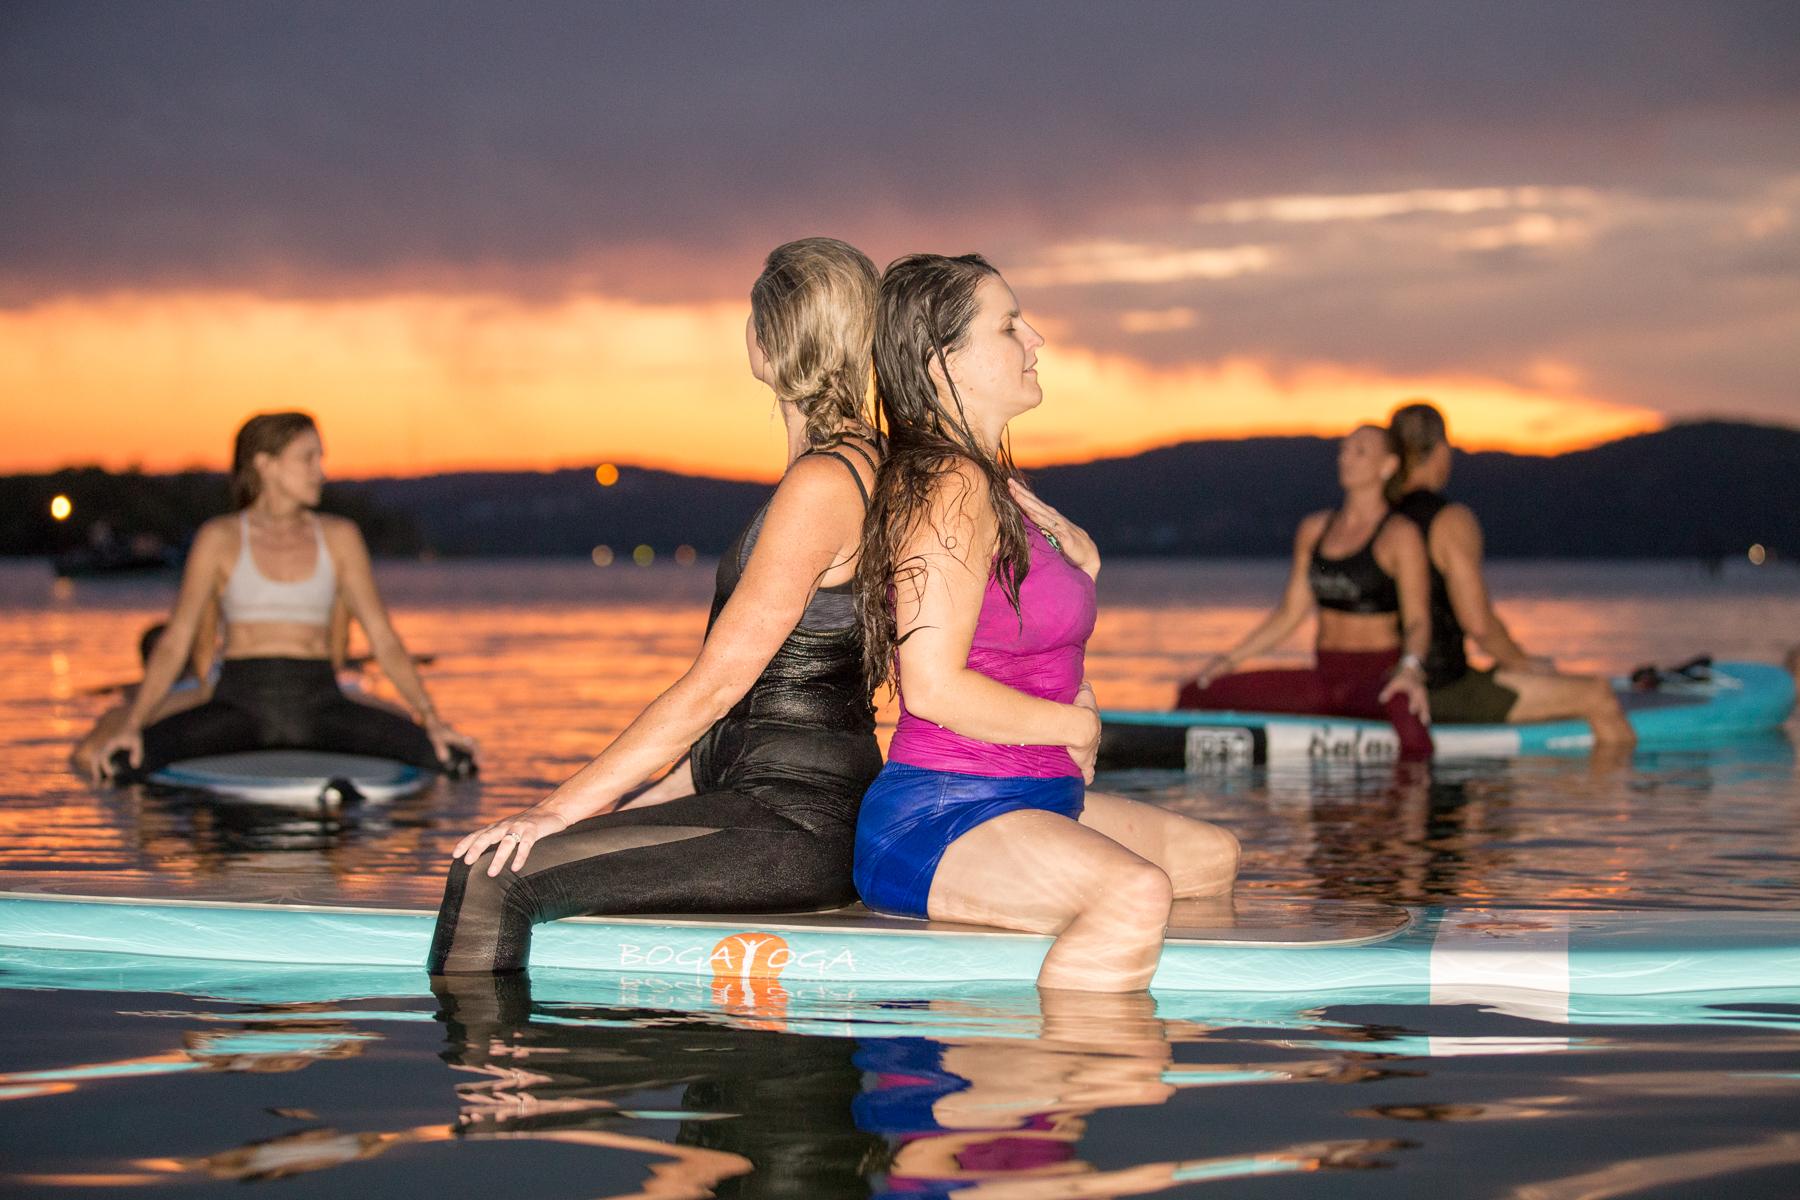 Partner SUP Yoga